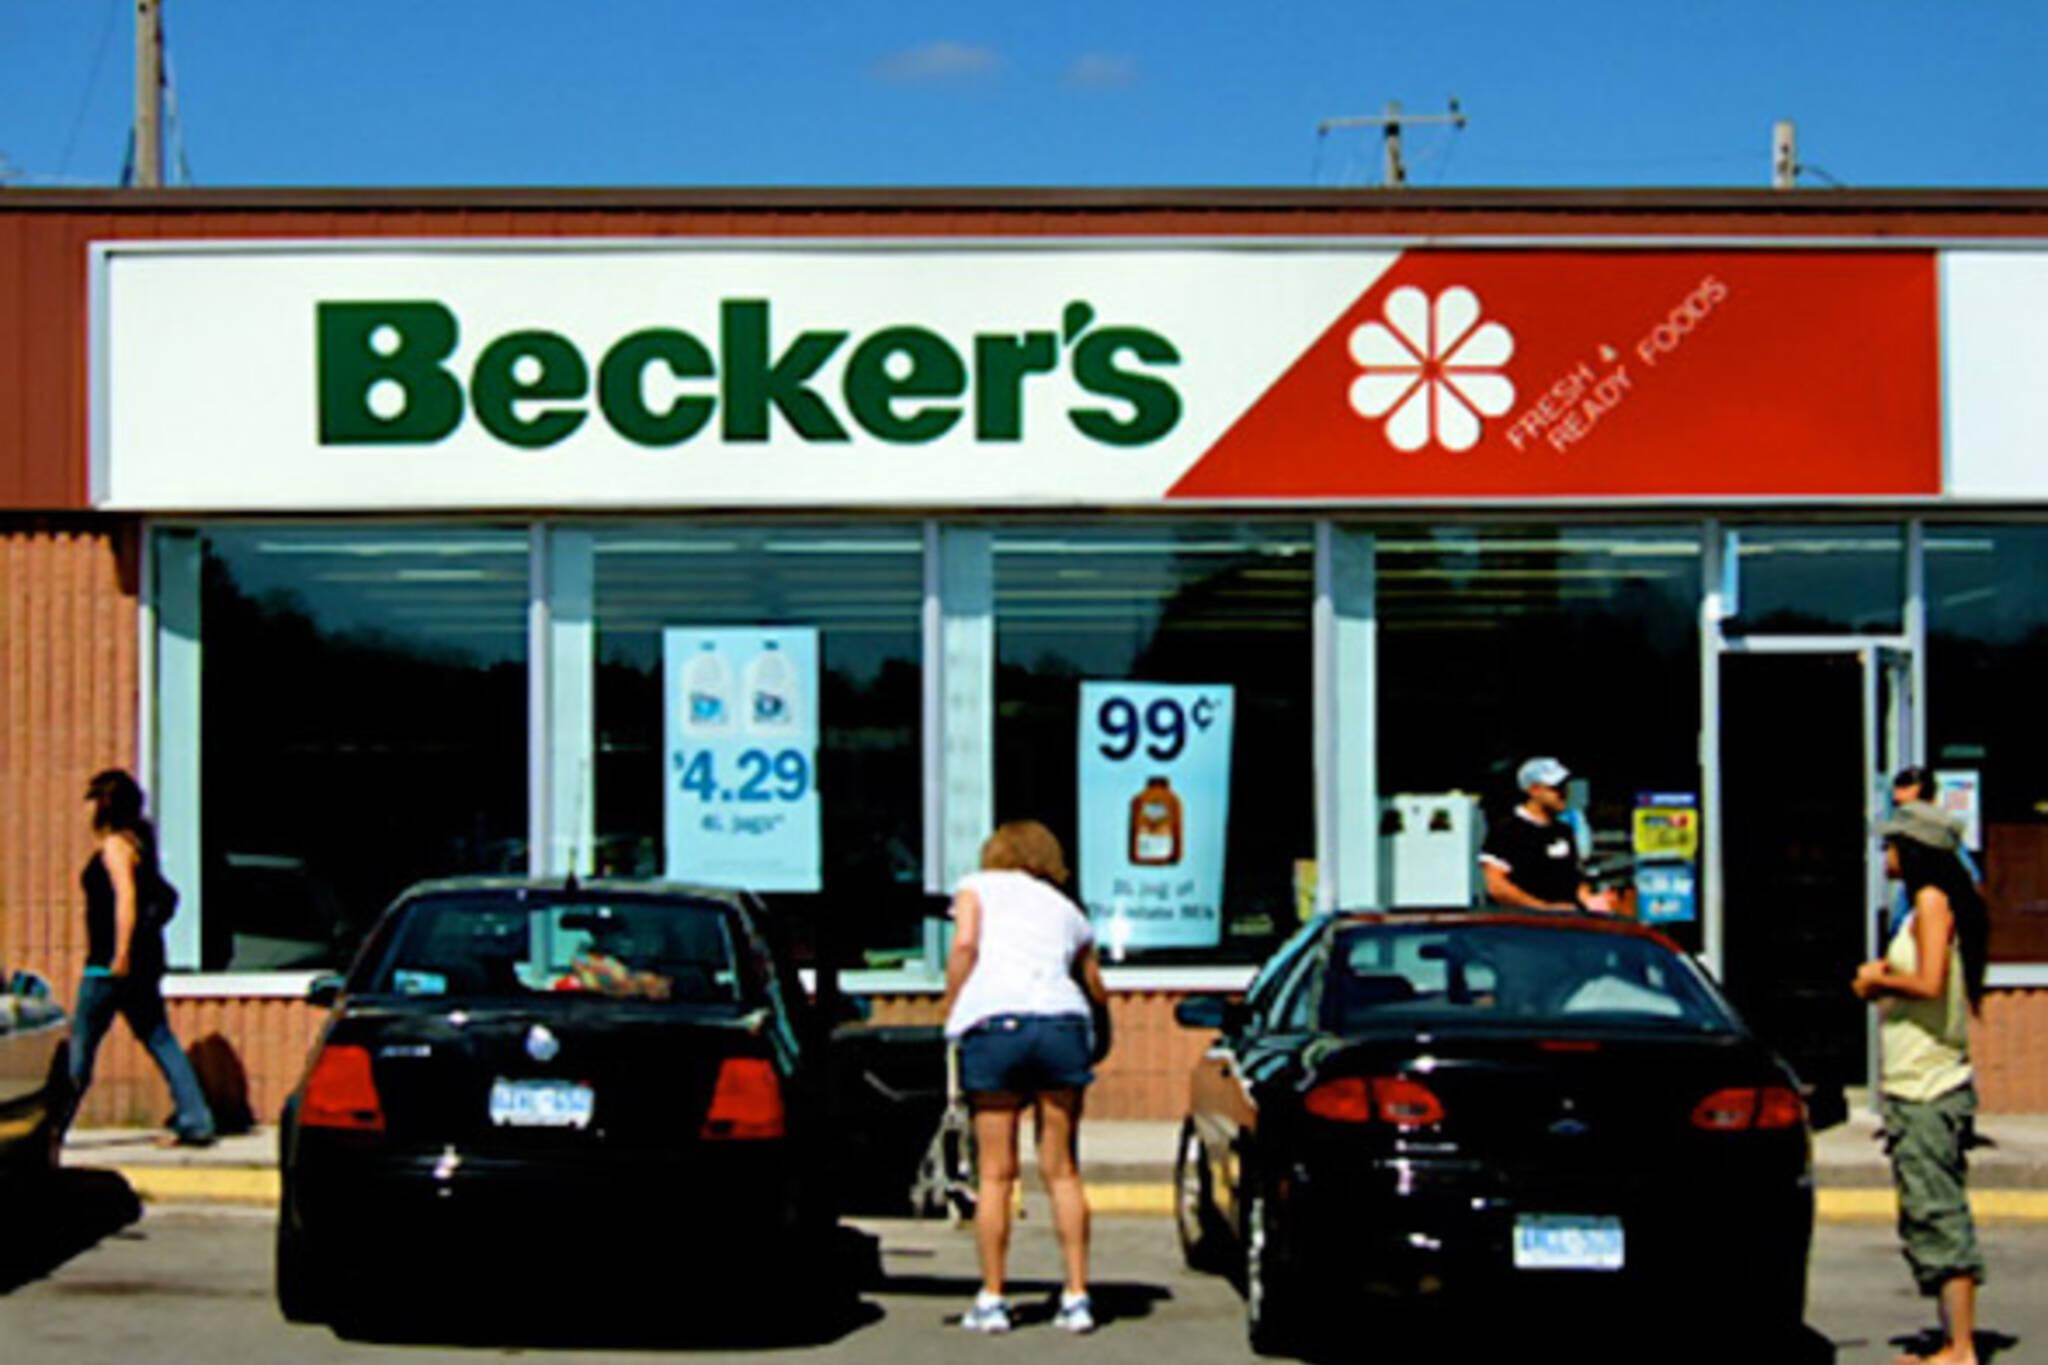 Beckers Toronto